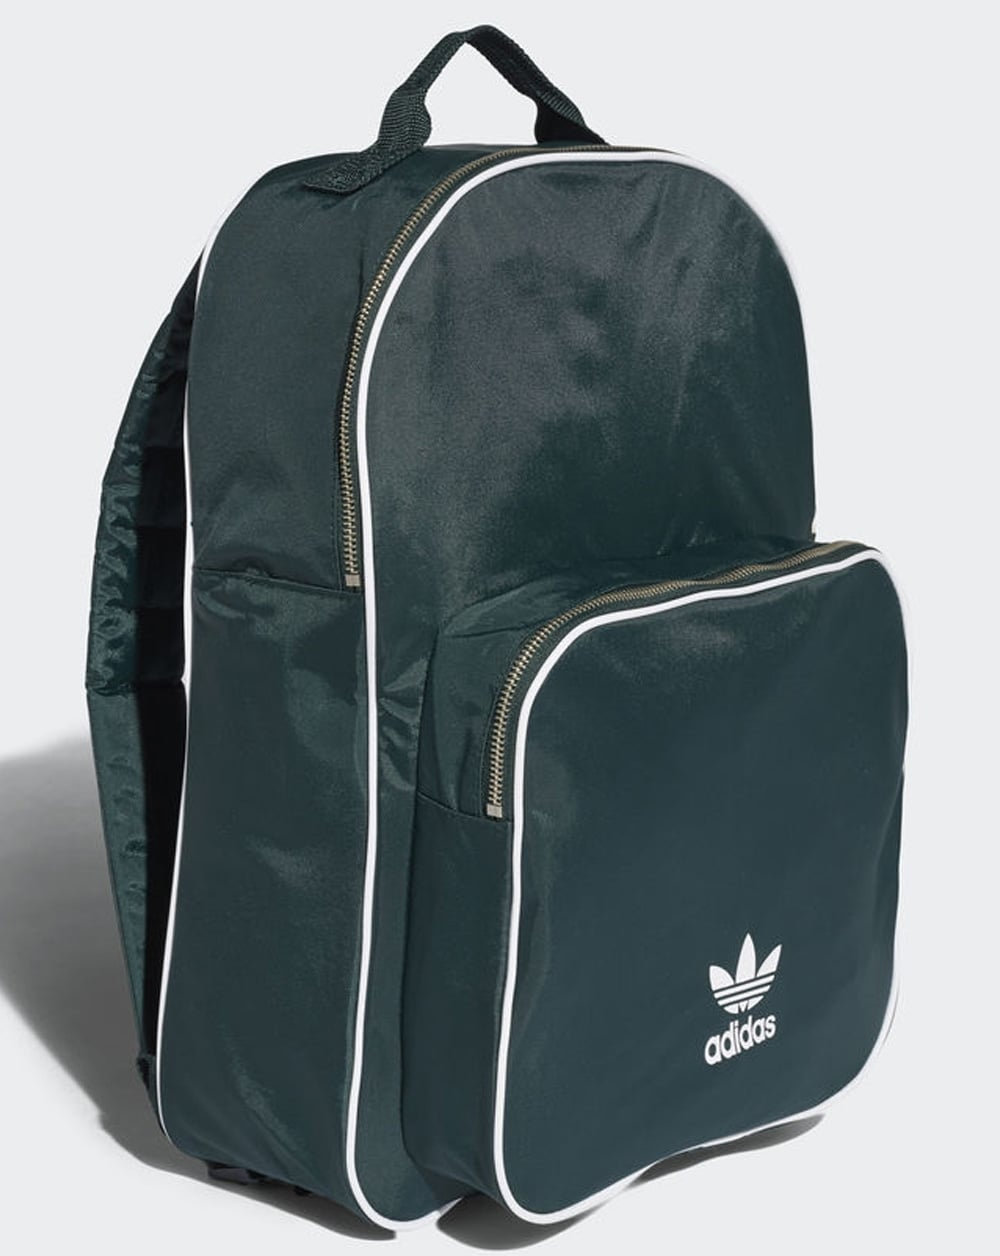 adidas Originals Adidas Originals Adicolor Backpack Green Night f040e62730448